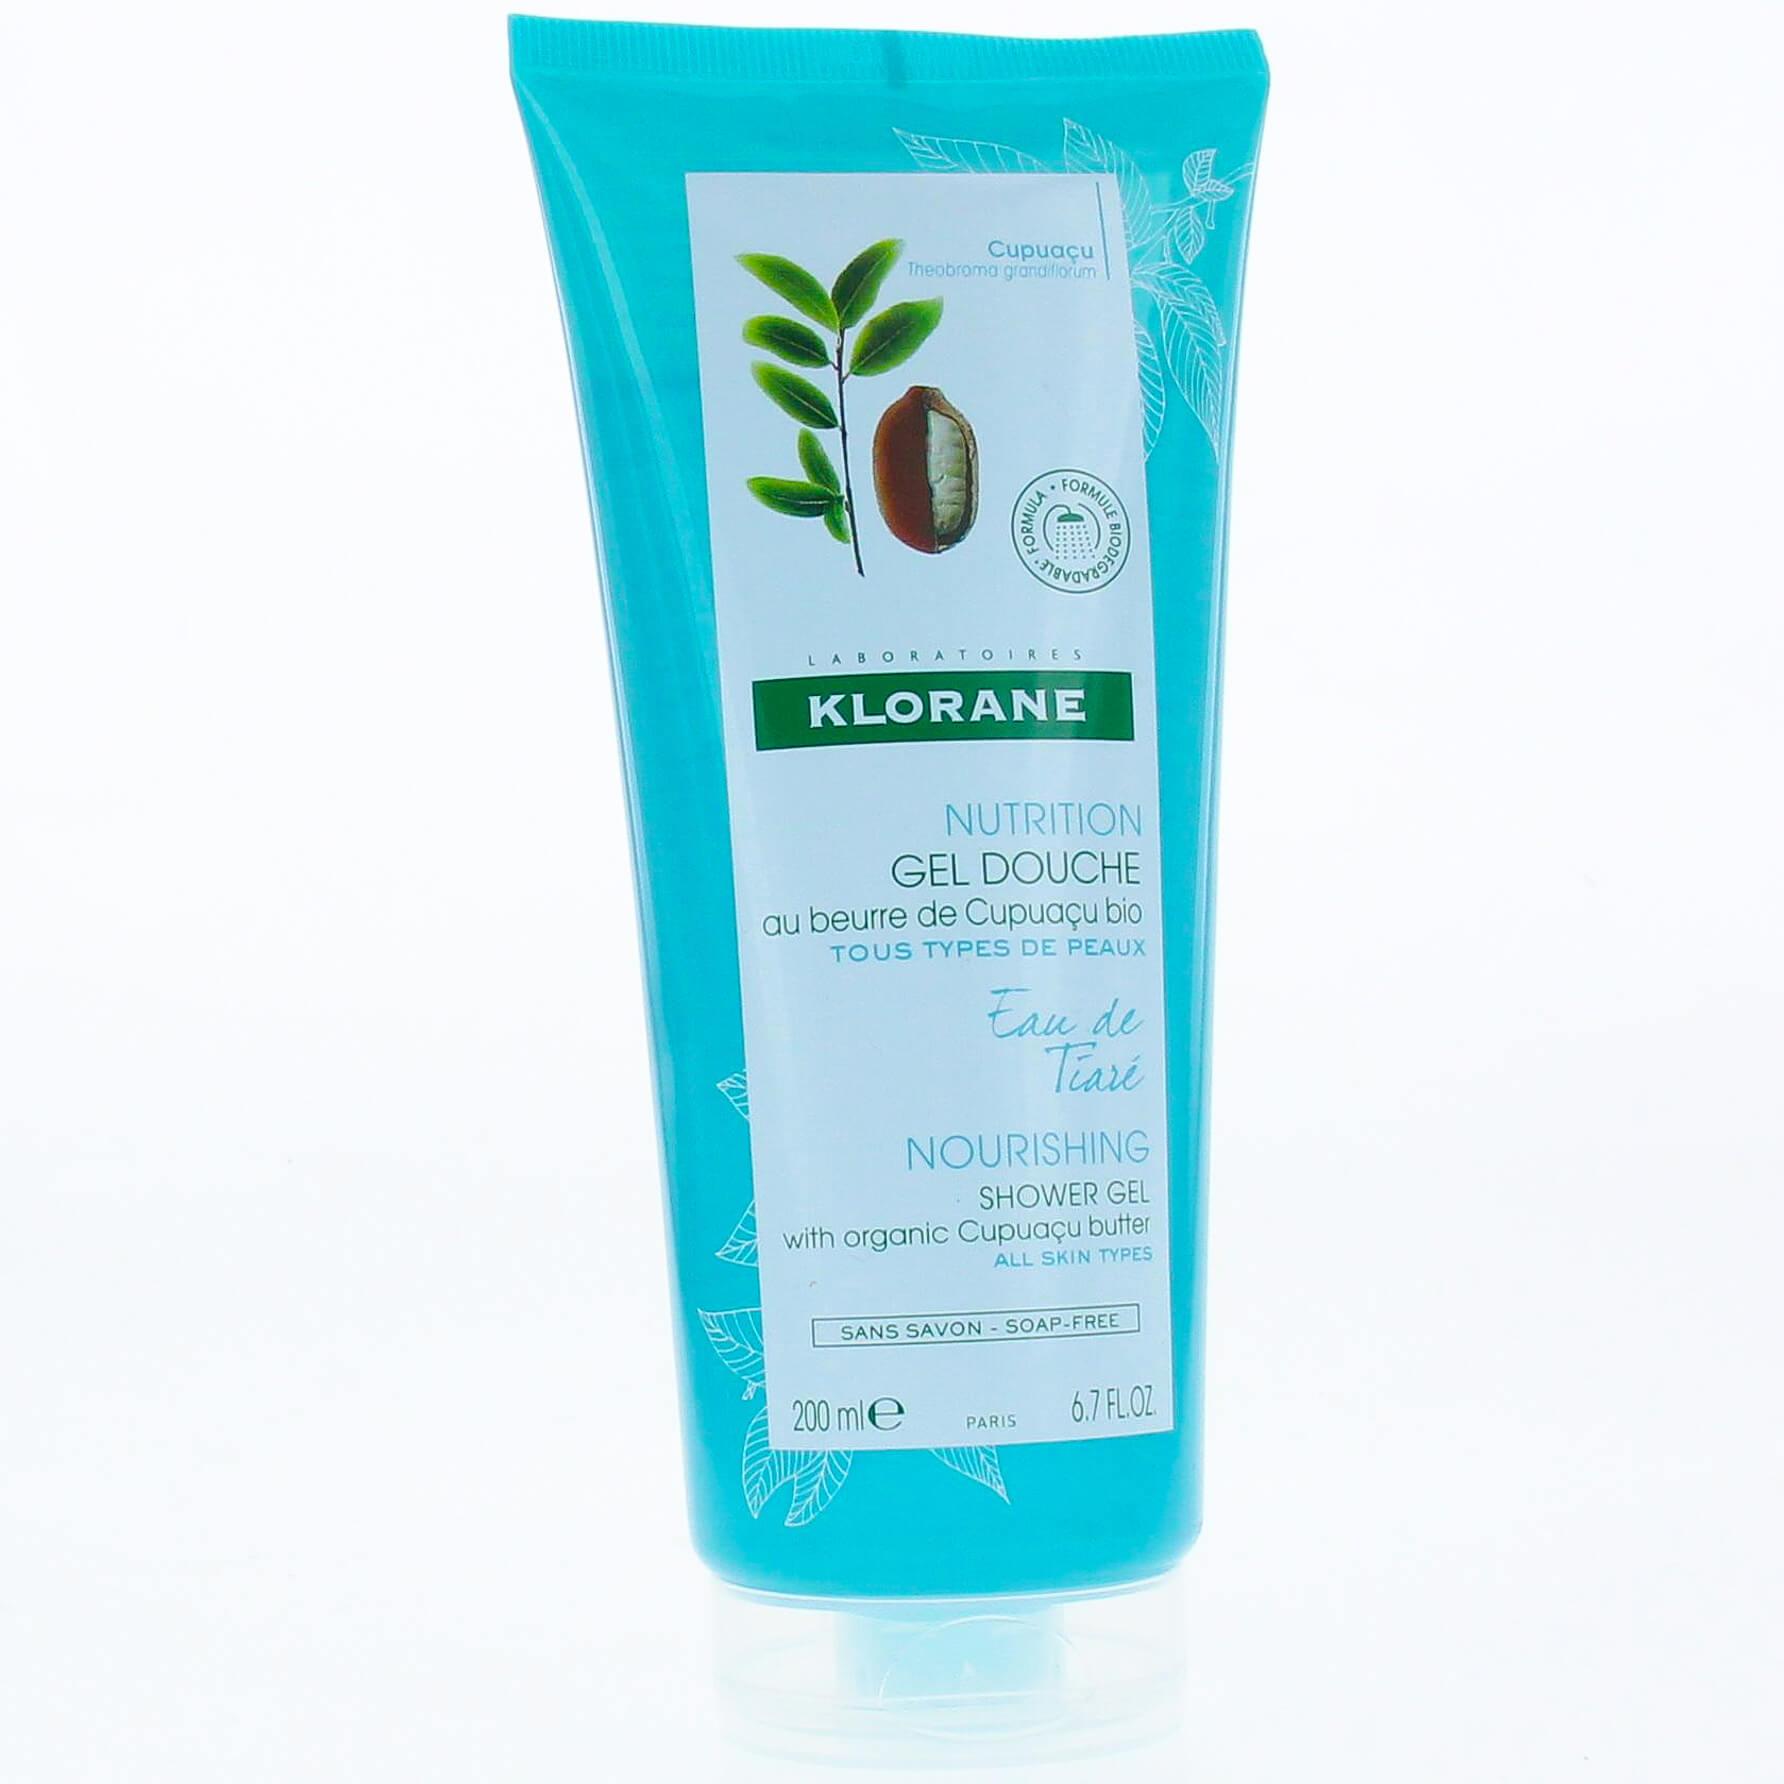 Klorane Nourishing Shower Gel with Organic Cupuacu Butter & Tiare Water Απαλό Αφρόλουτρο με Άρωμα Νερού Γαρδένιας 200ml